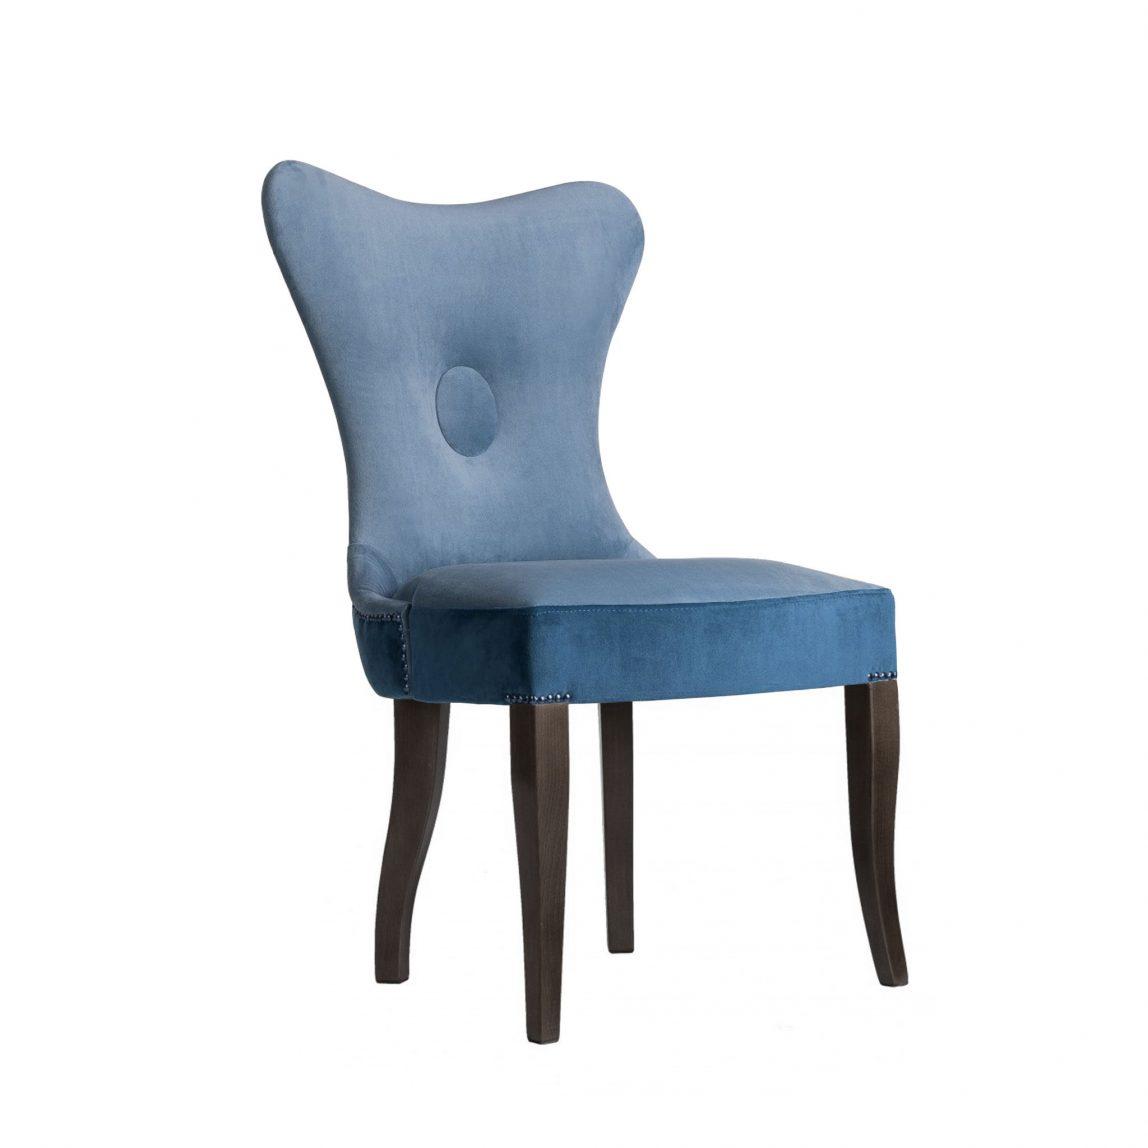 Мягкий обеденный стул Орфей